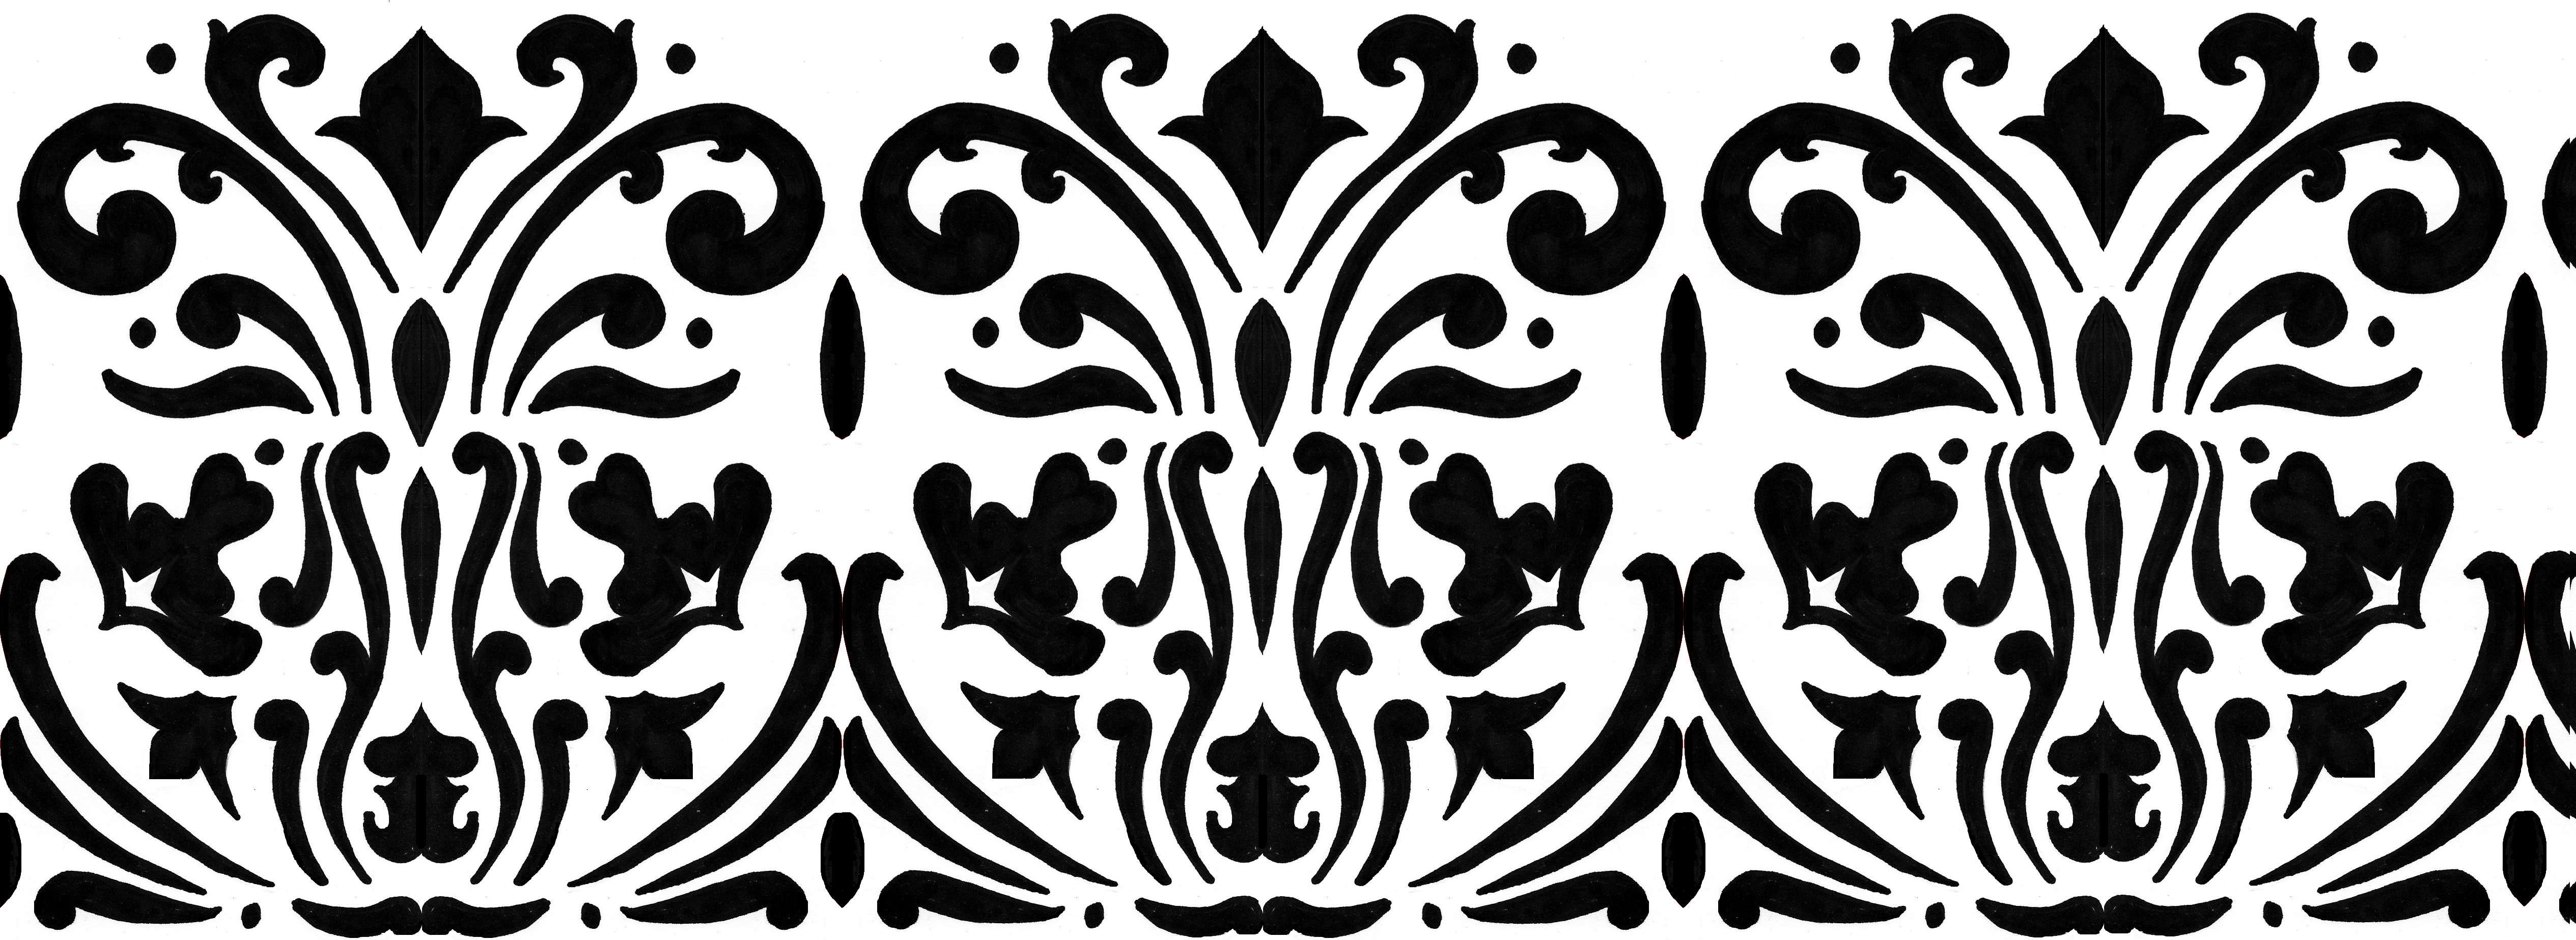 Free Black And White Damask Border, Download Free Clip Art, Free.